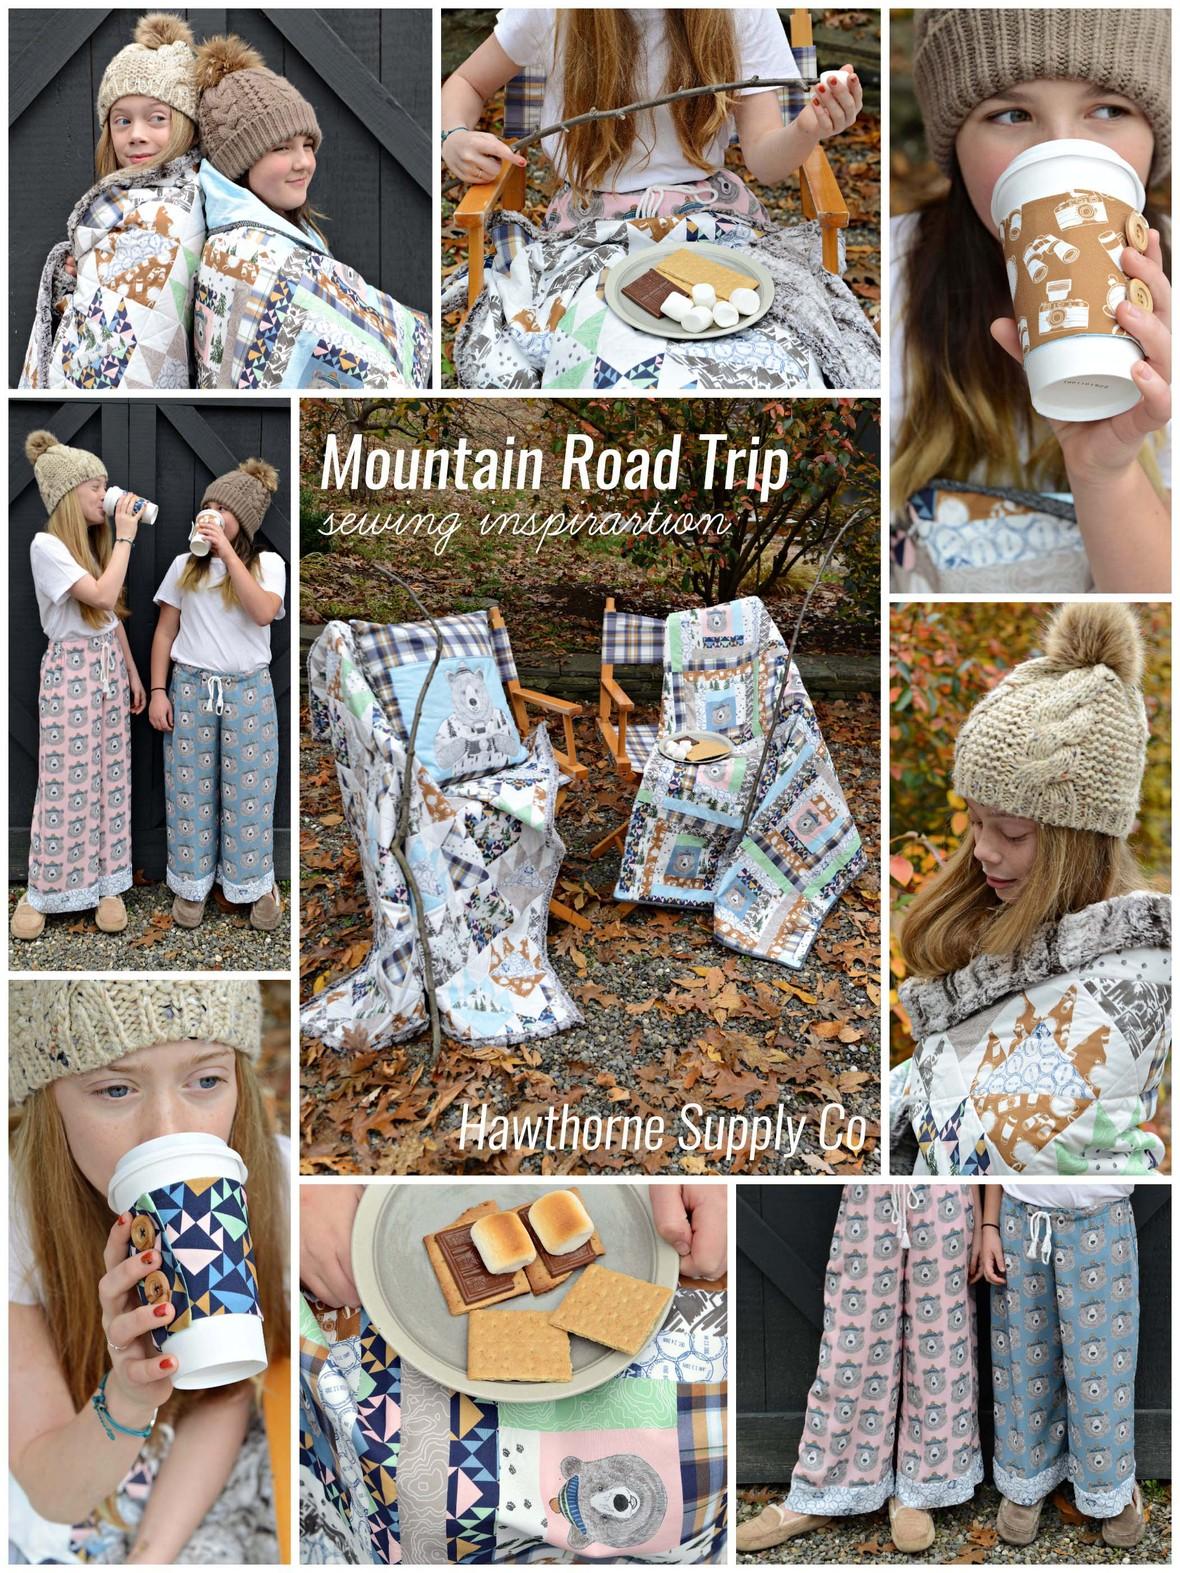 Mountain Road Trip Fabric sewing inspiraation